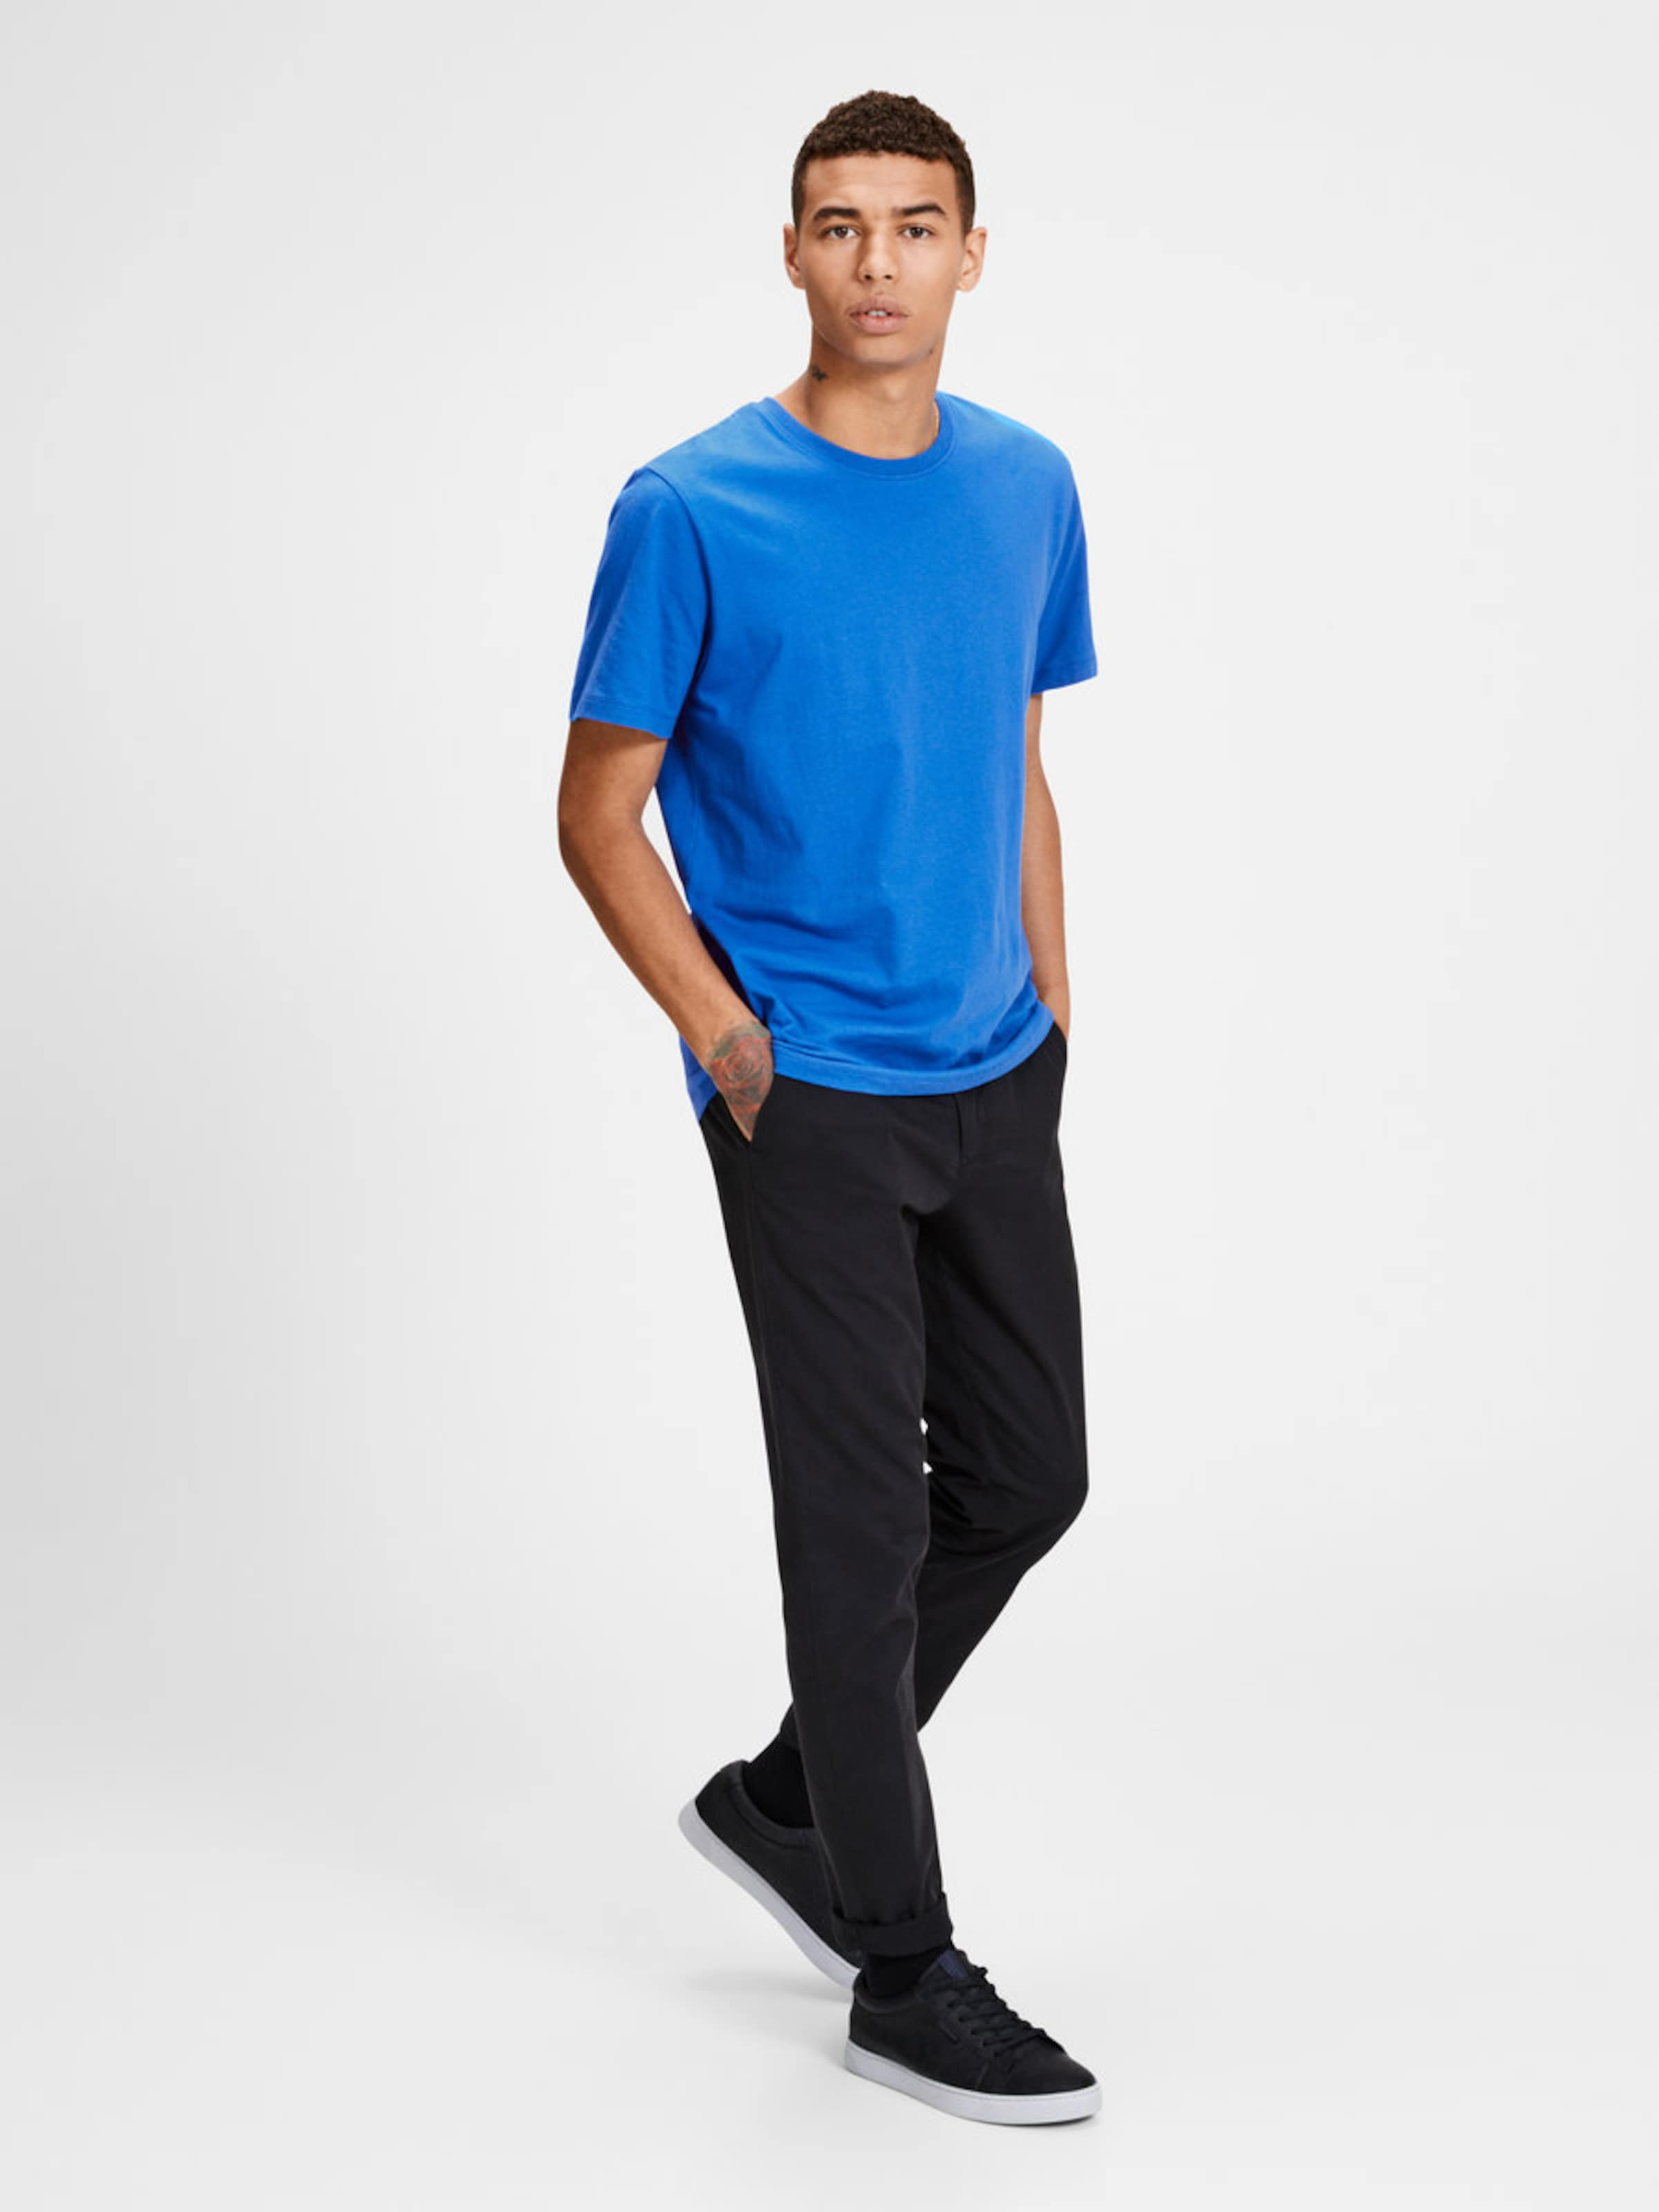 Rabatt Verkauf JACK & JONES Basic T-Shirt Billig Verkauf Zum Verkauf Billiger Fabrikverkauf Rabatt Billigsten Verkauf Shop-Angebot YUh1L